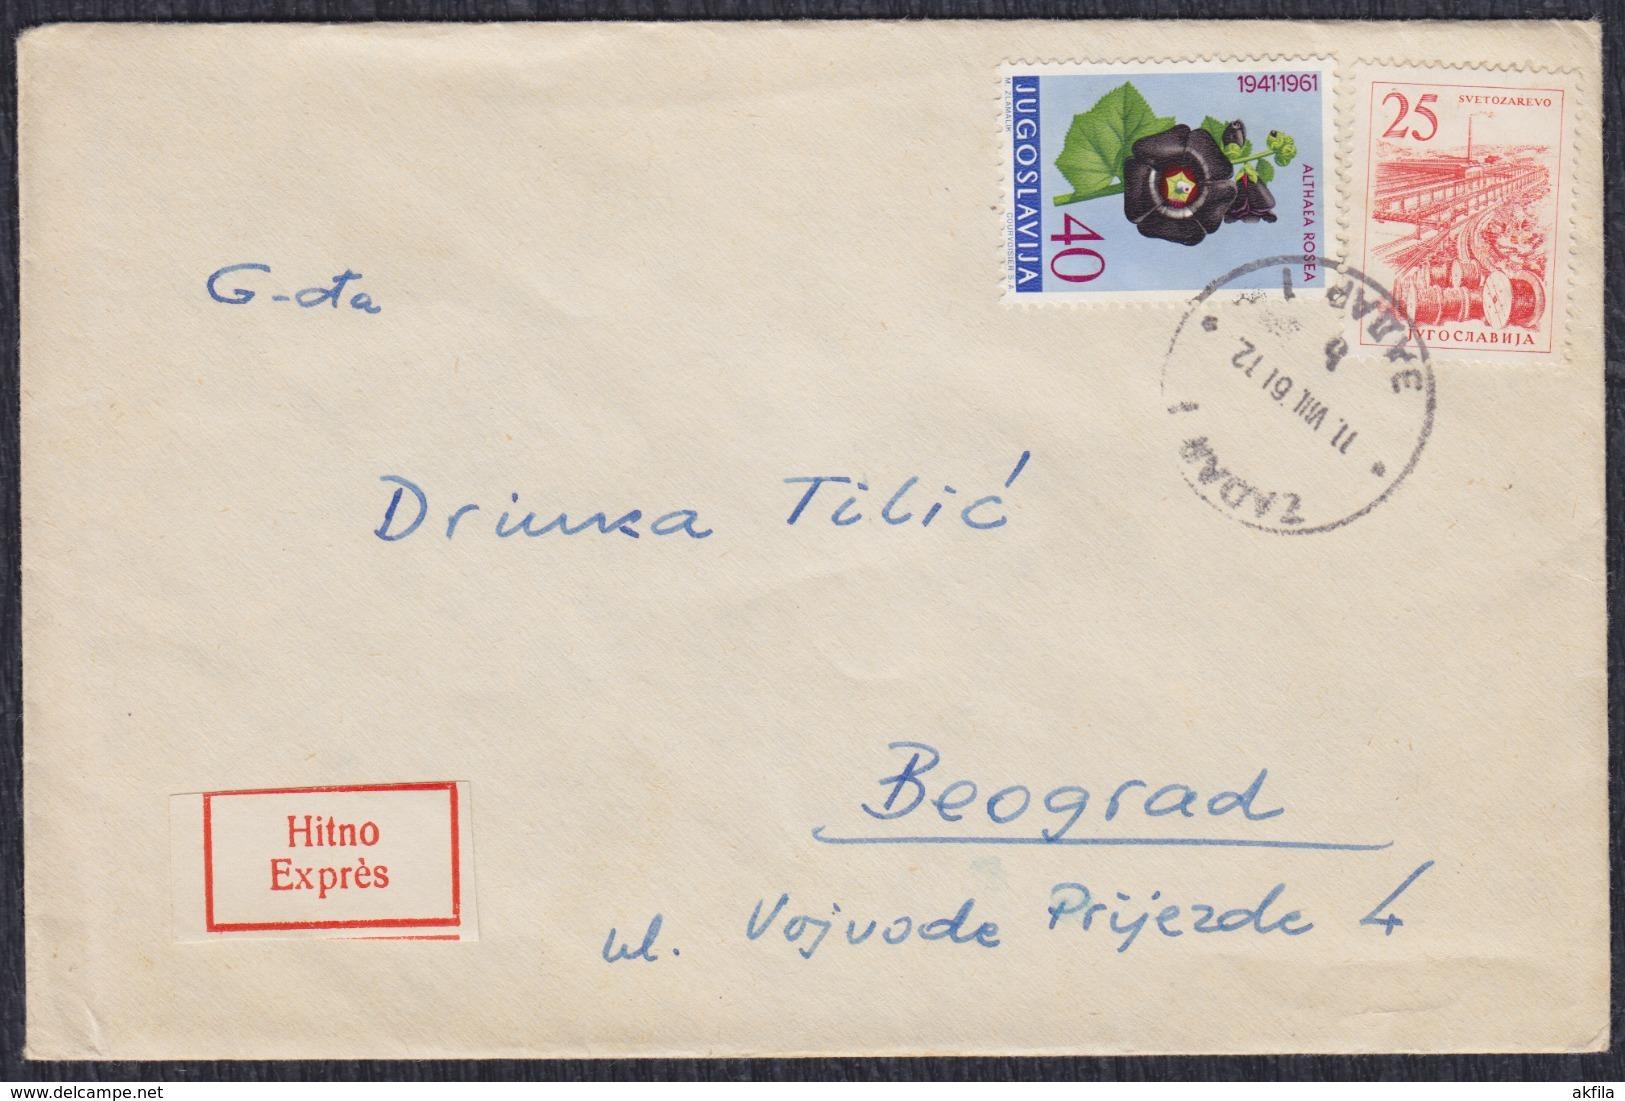 Yugoslavia 1961 Express Letter Sent From Zadar To Beograd - Briefe U. Dokumente